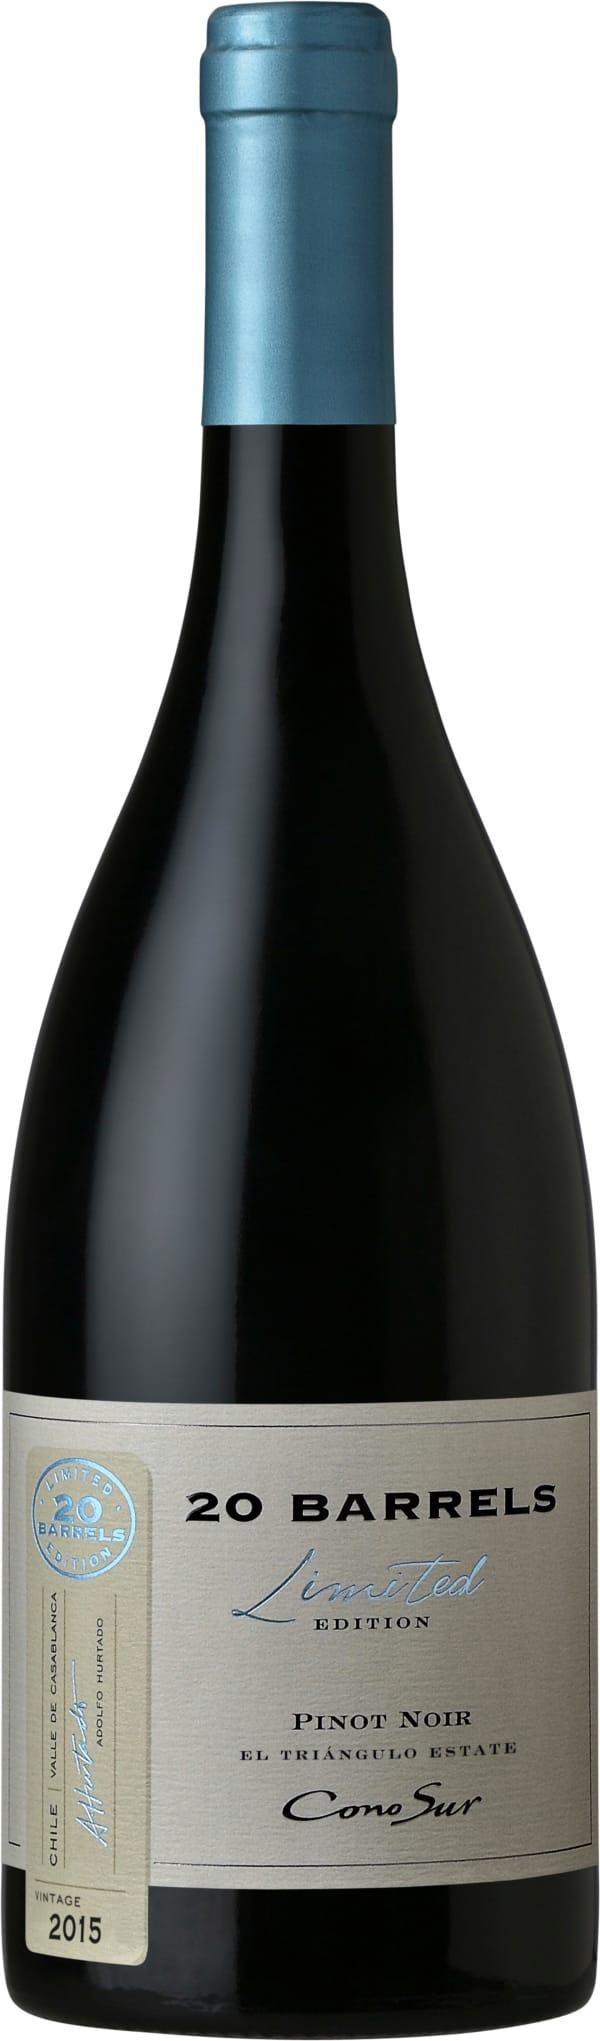 Cono Sur 20 Barrels Pinot Noir 2017